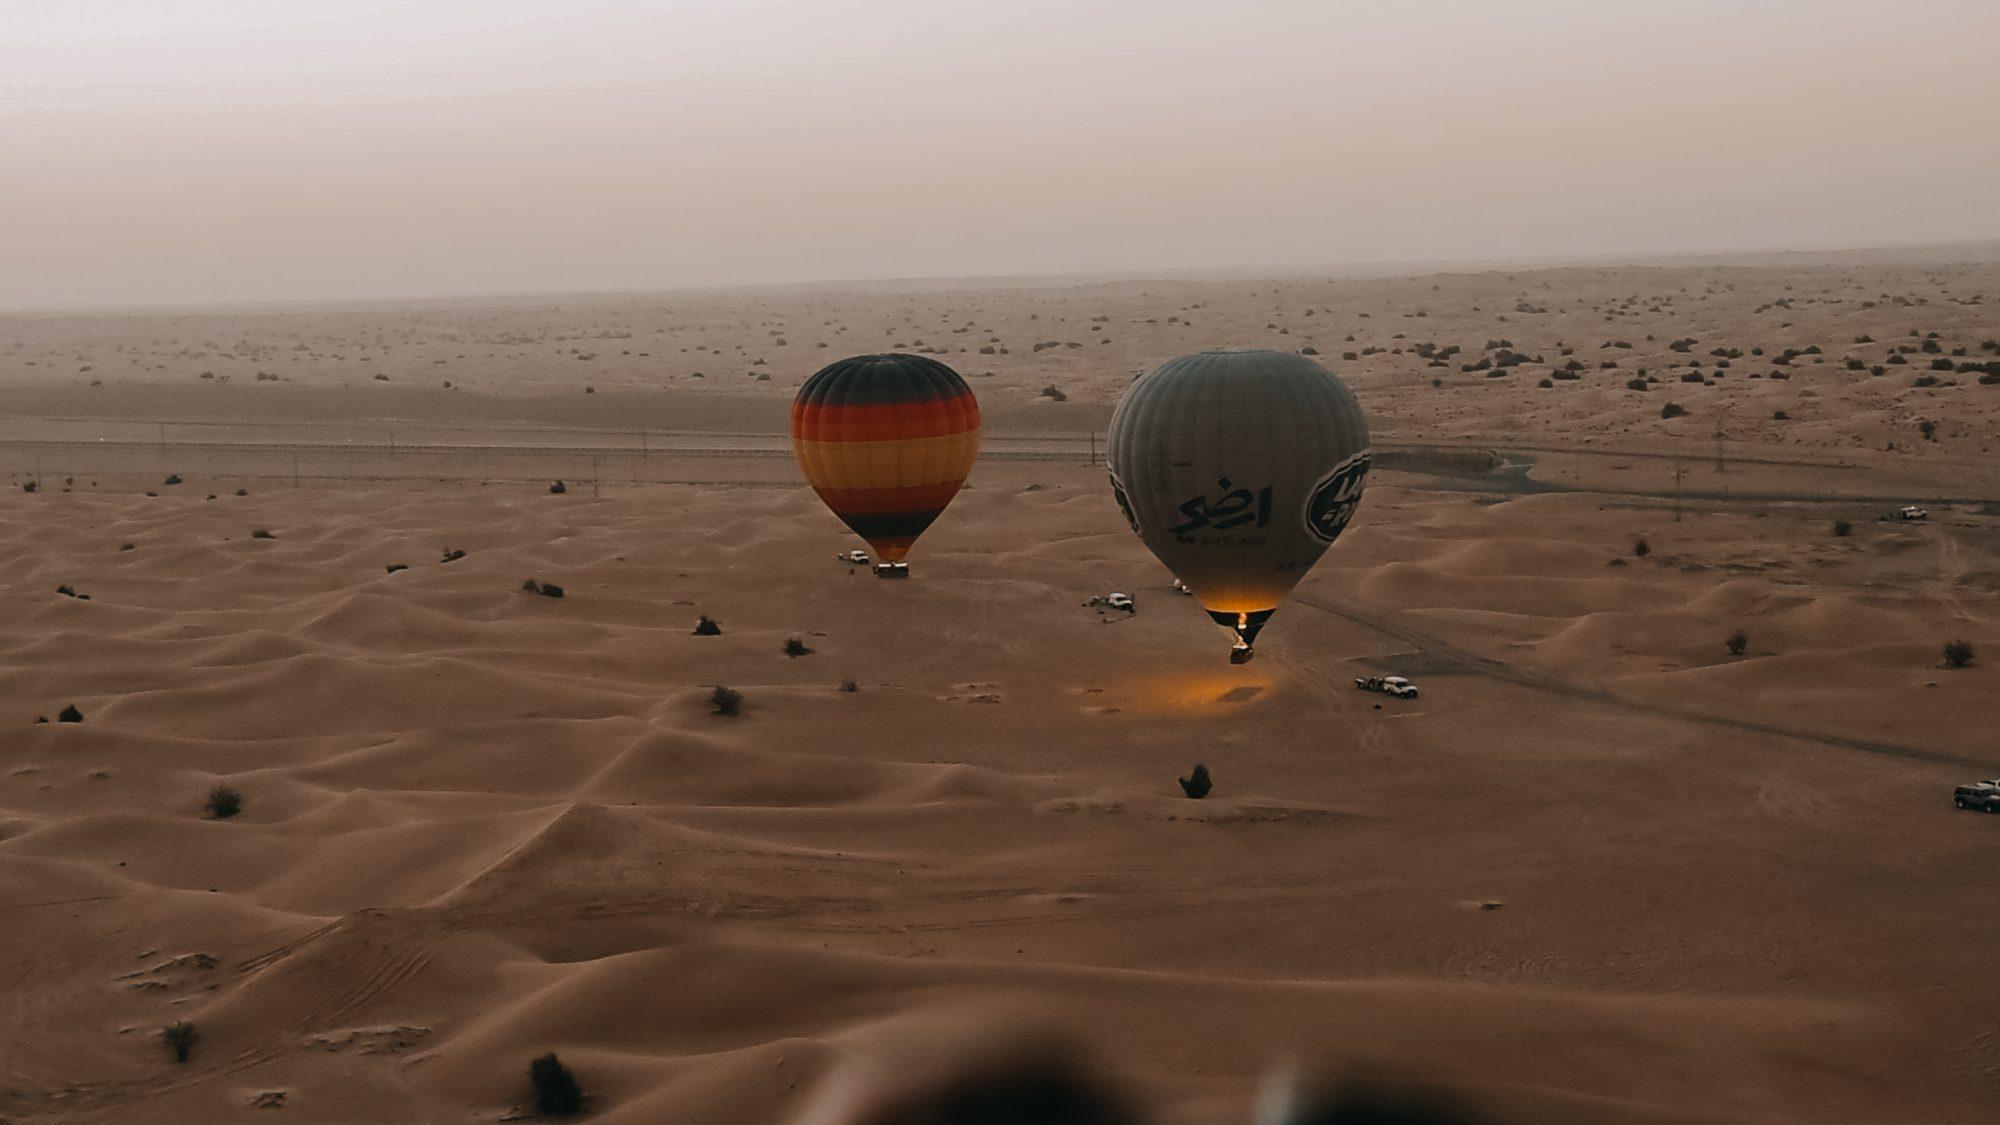 Image for Dubai Travel Diary || Overnight Desert Safari & Hot Air Balloon Flight [Part 1]